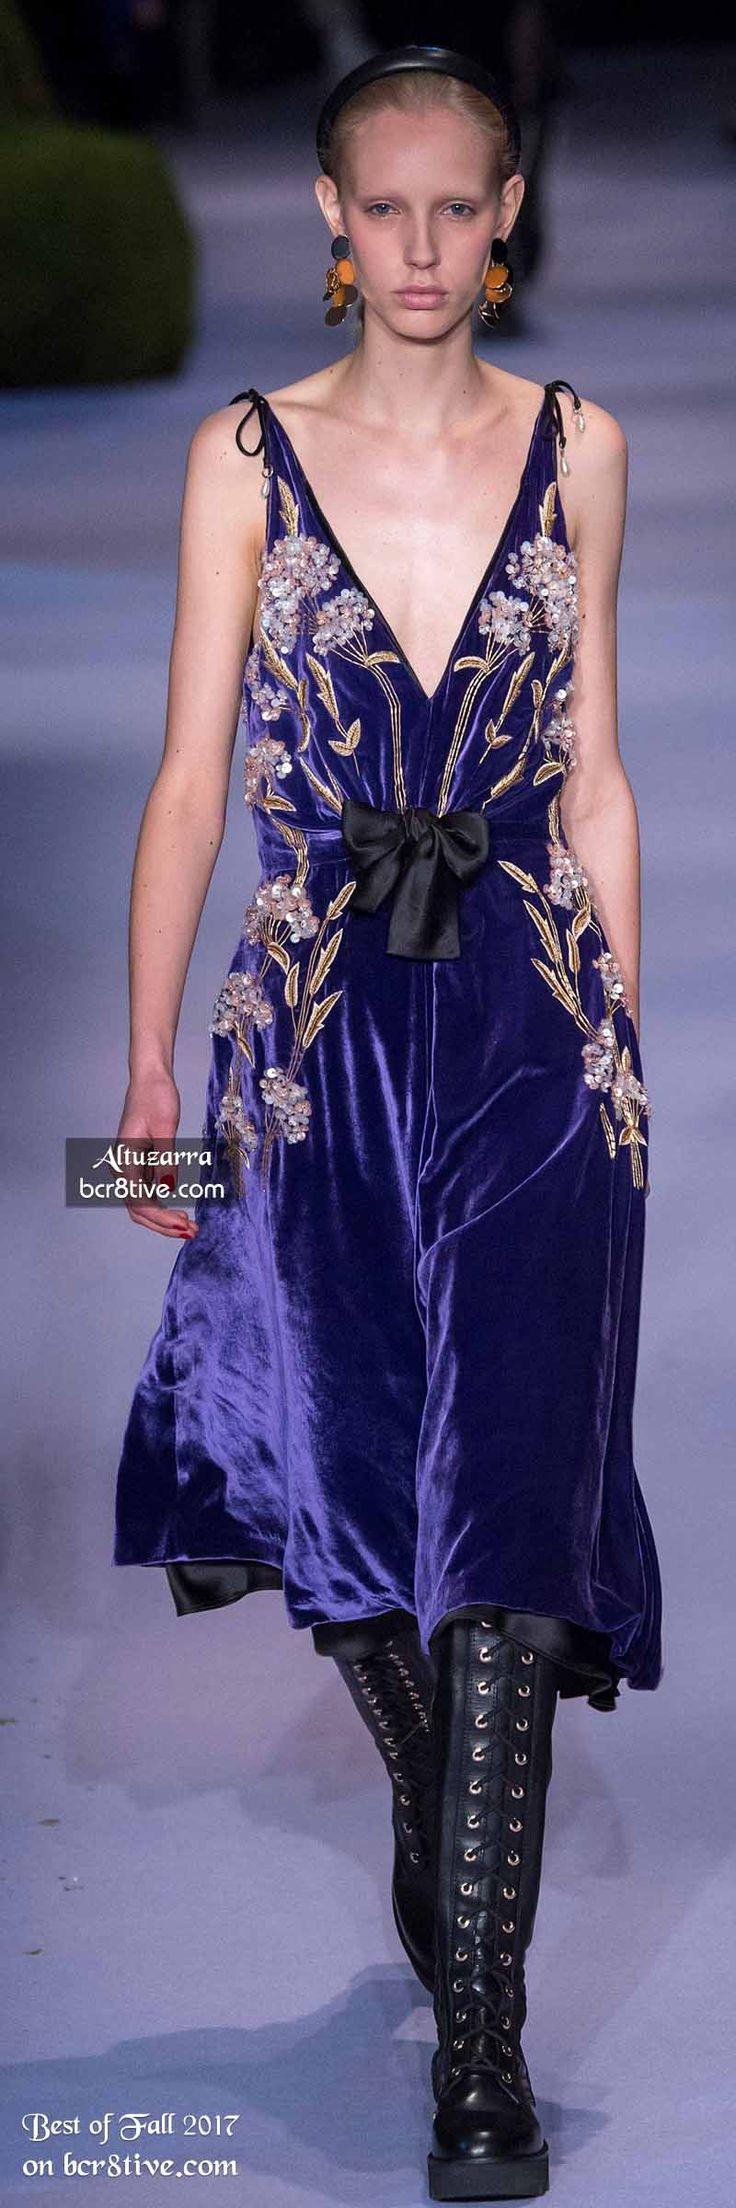 700 best Fashion: Dresses images on Pinterest   Actresses, Dressy ...